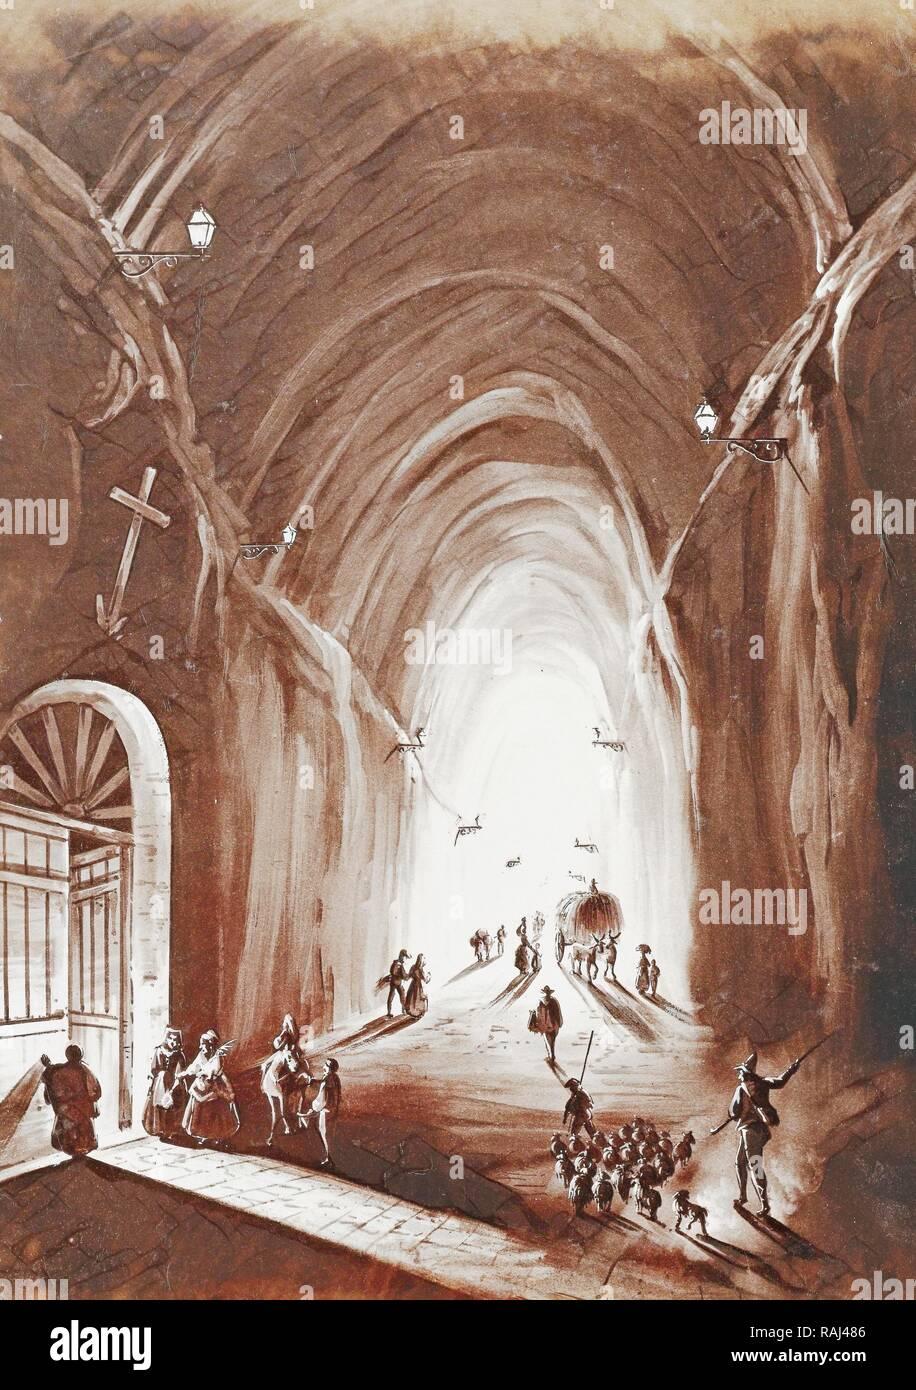 Piedigrotta Naples Napoli Italy Reimagined By Gibon Classic Art